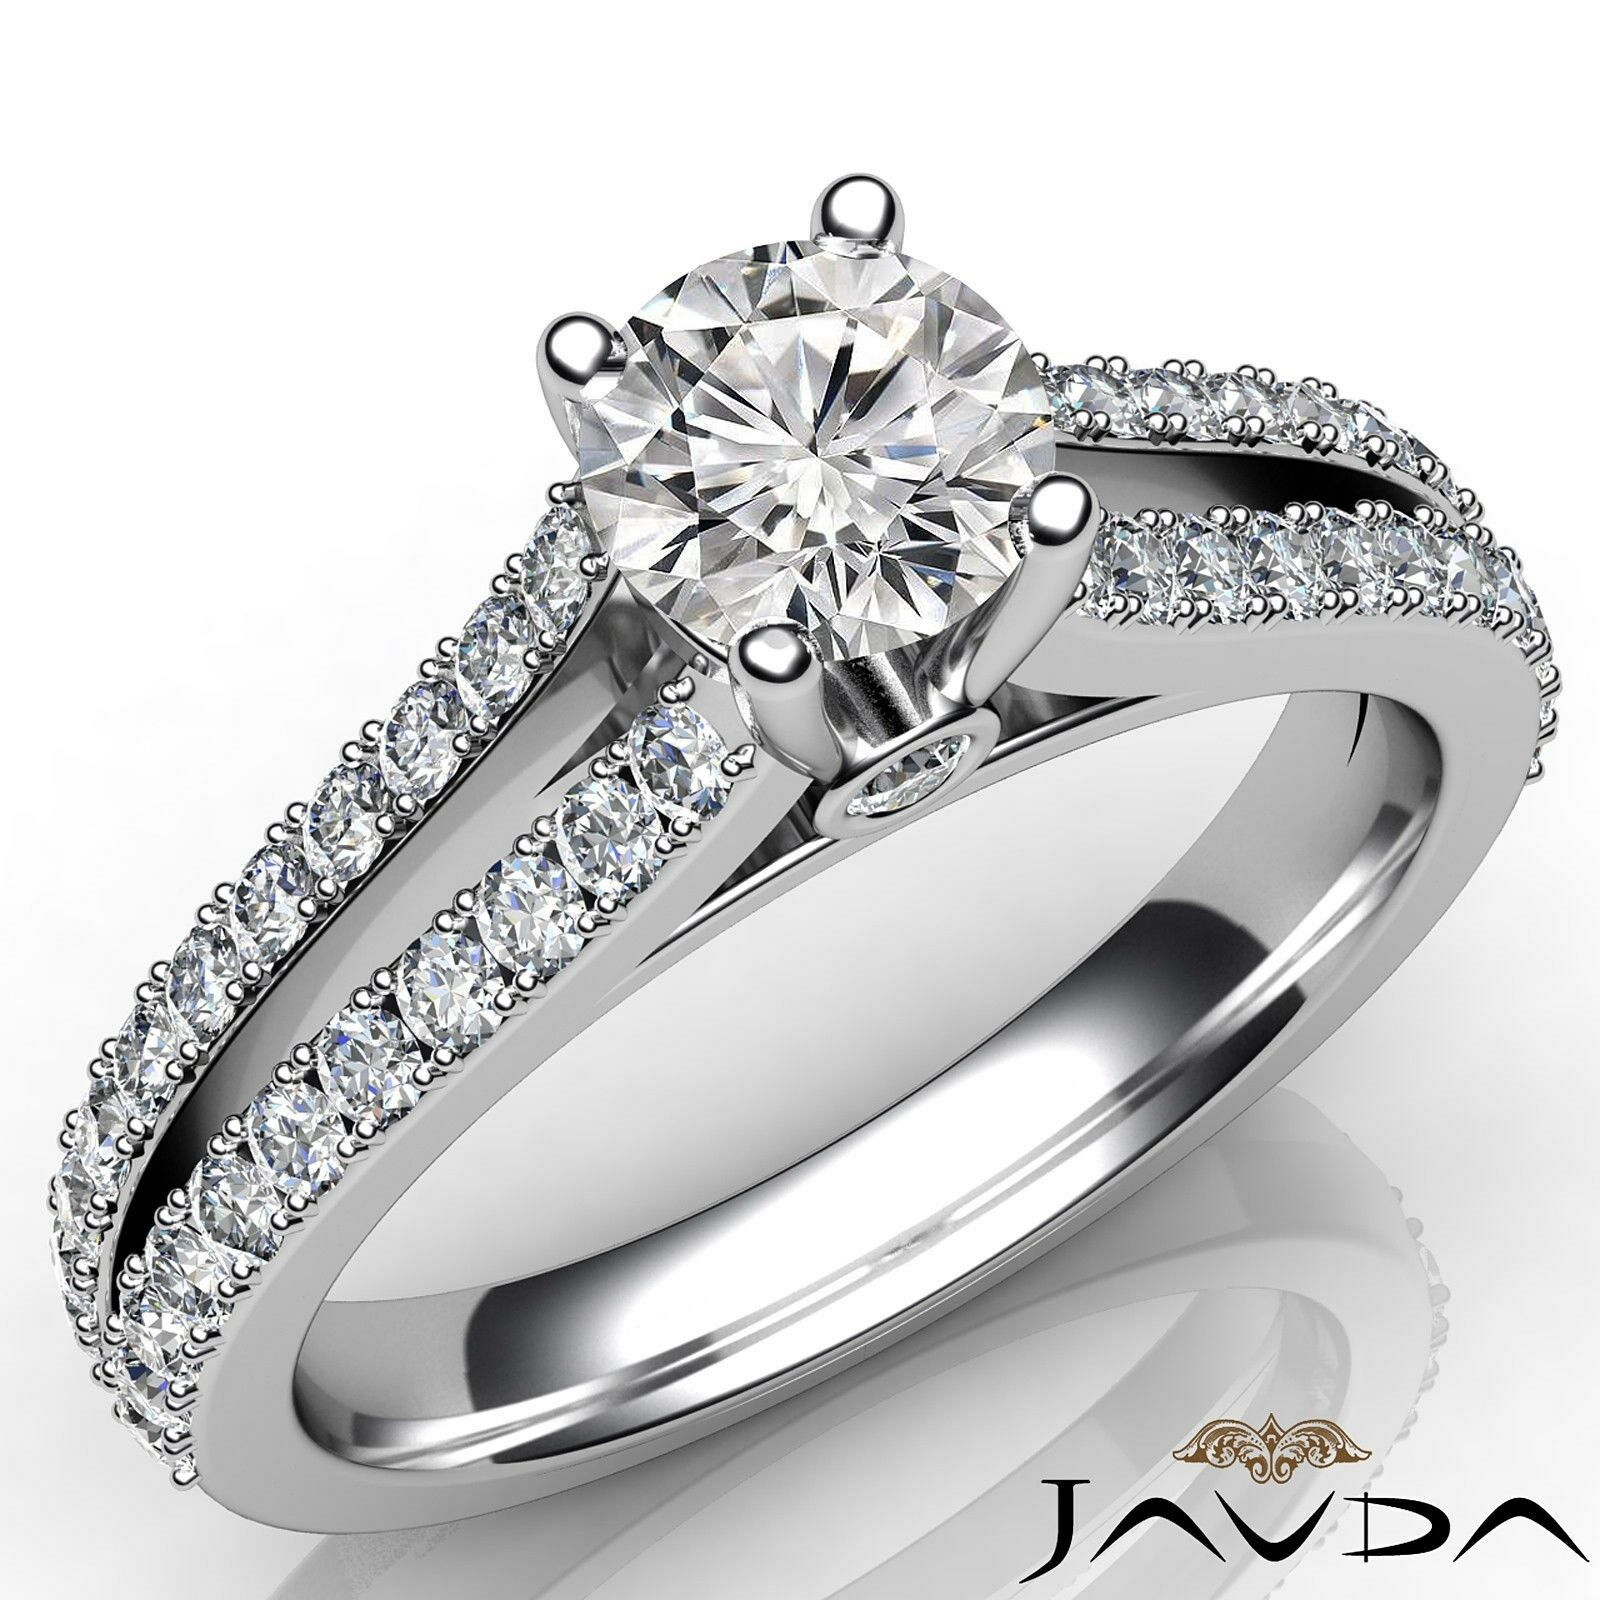 Split Shank Round Diamond Engagement Double Prong Bezel Ring GIA F VVS1 1.15 Ct